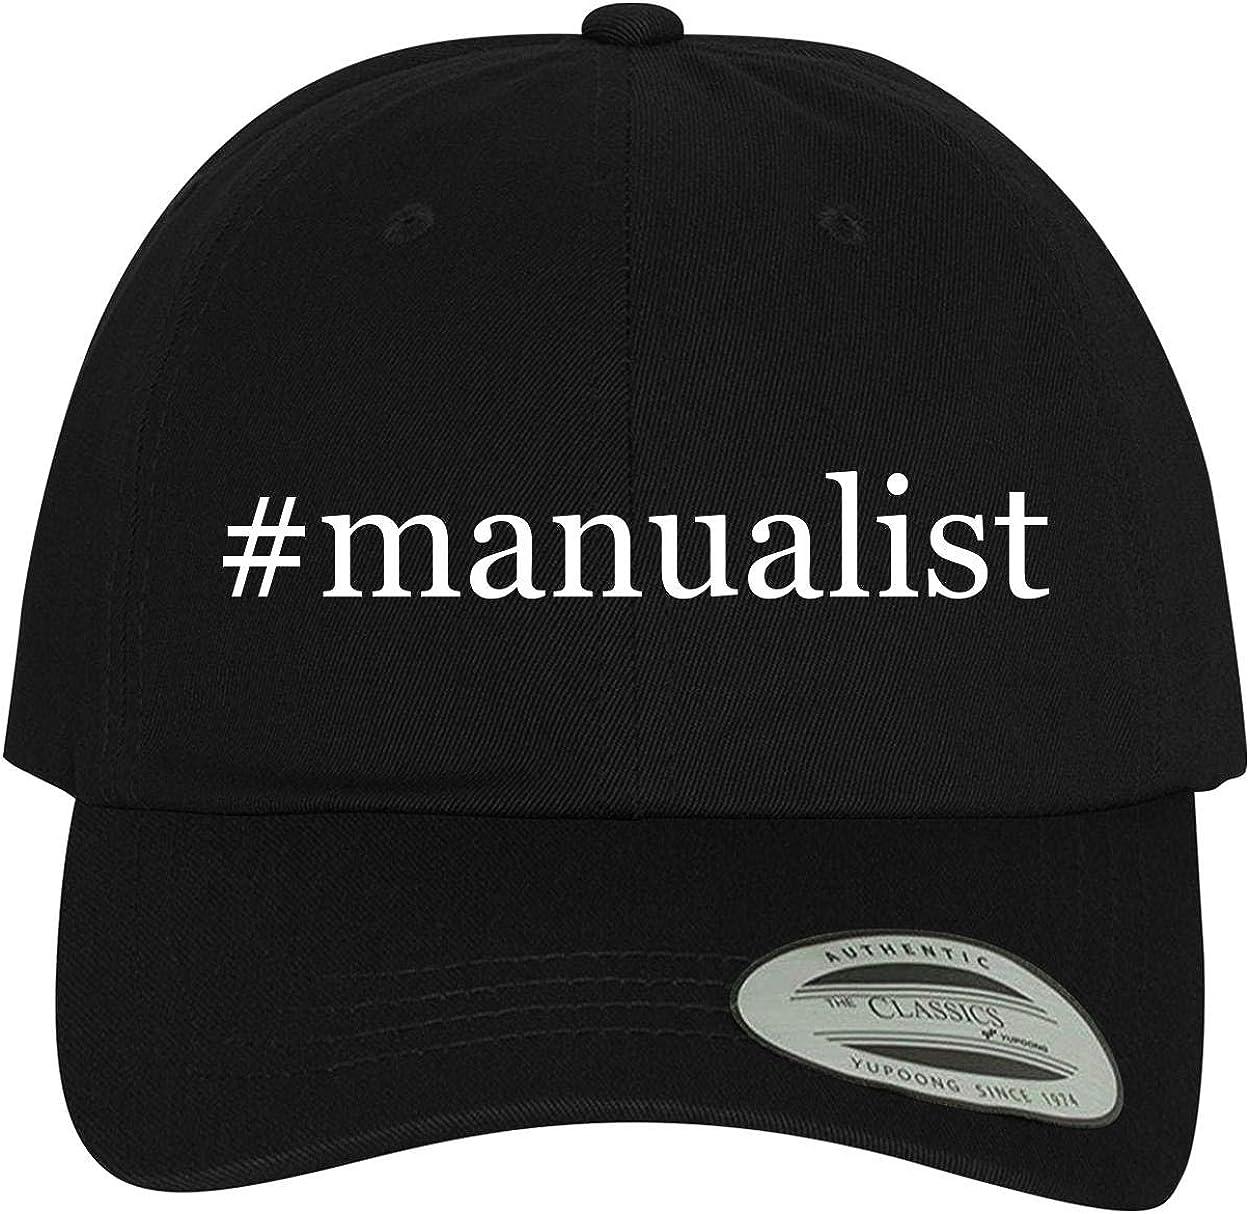 BH Cool Designs #Manualist Comfortable Dad Hat Baseball Cap